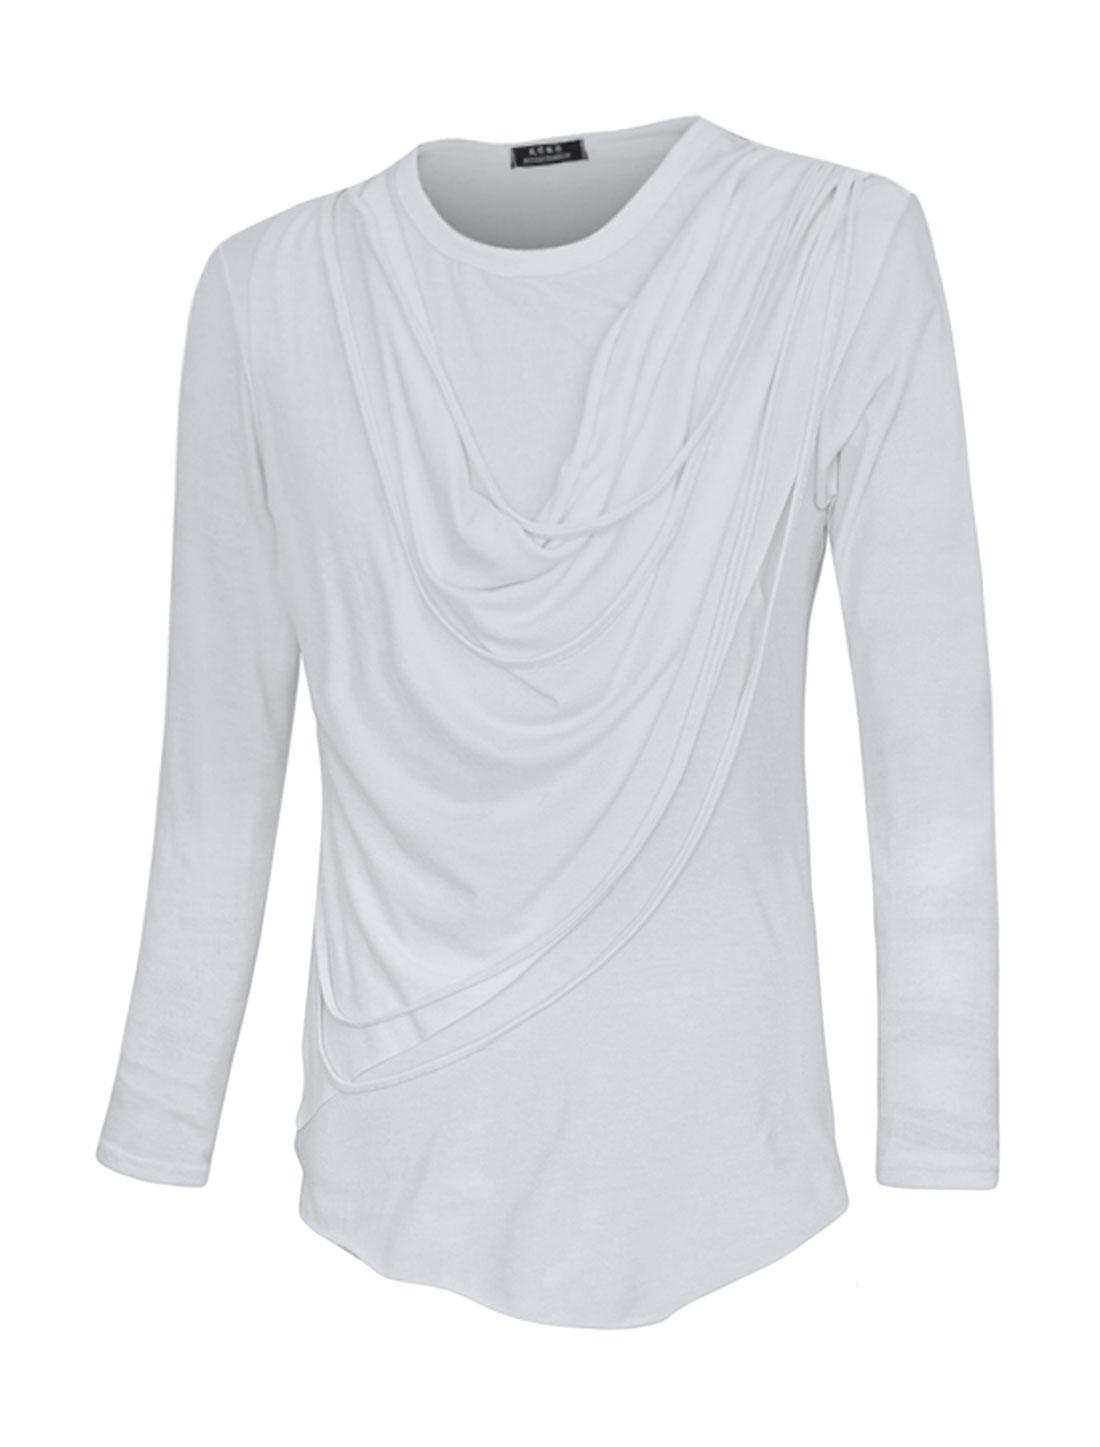 Men Crew Neck Tassels Cowl Design Slim Fit T-Shirt White M